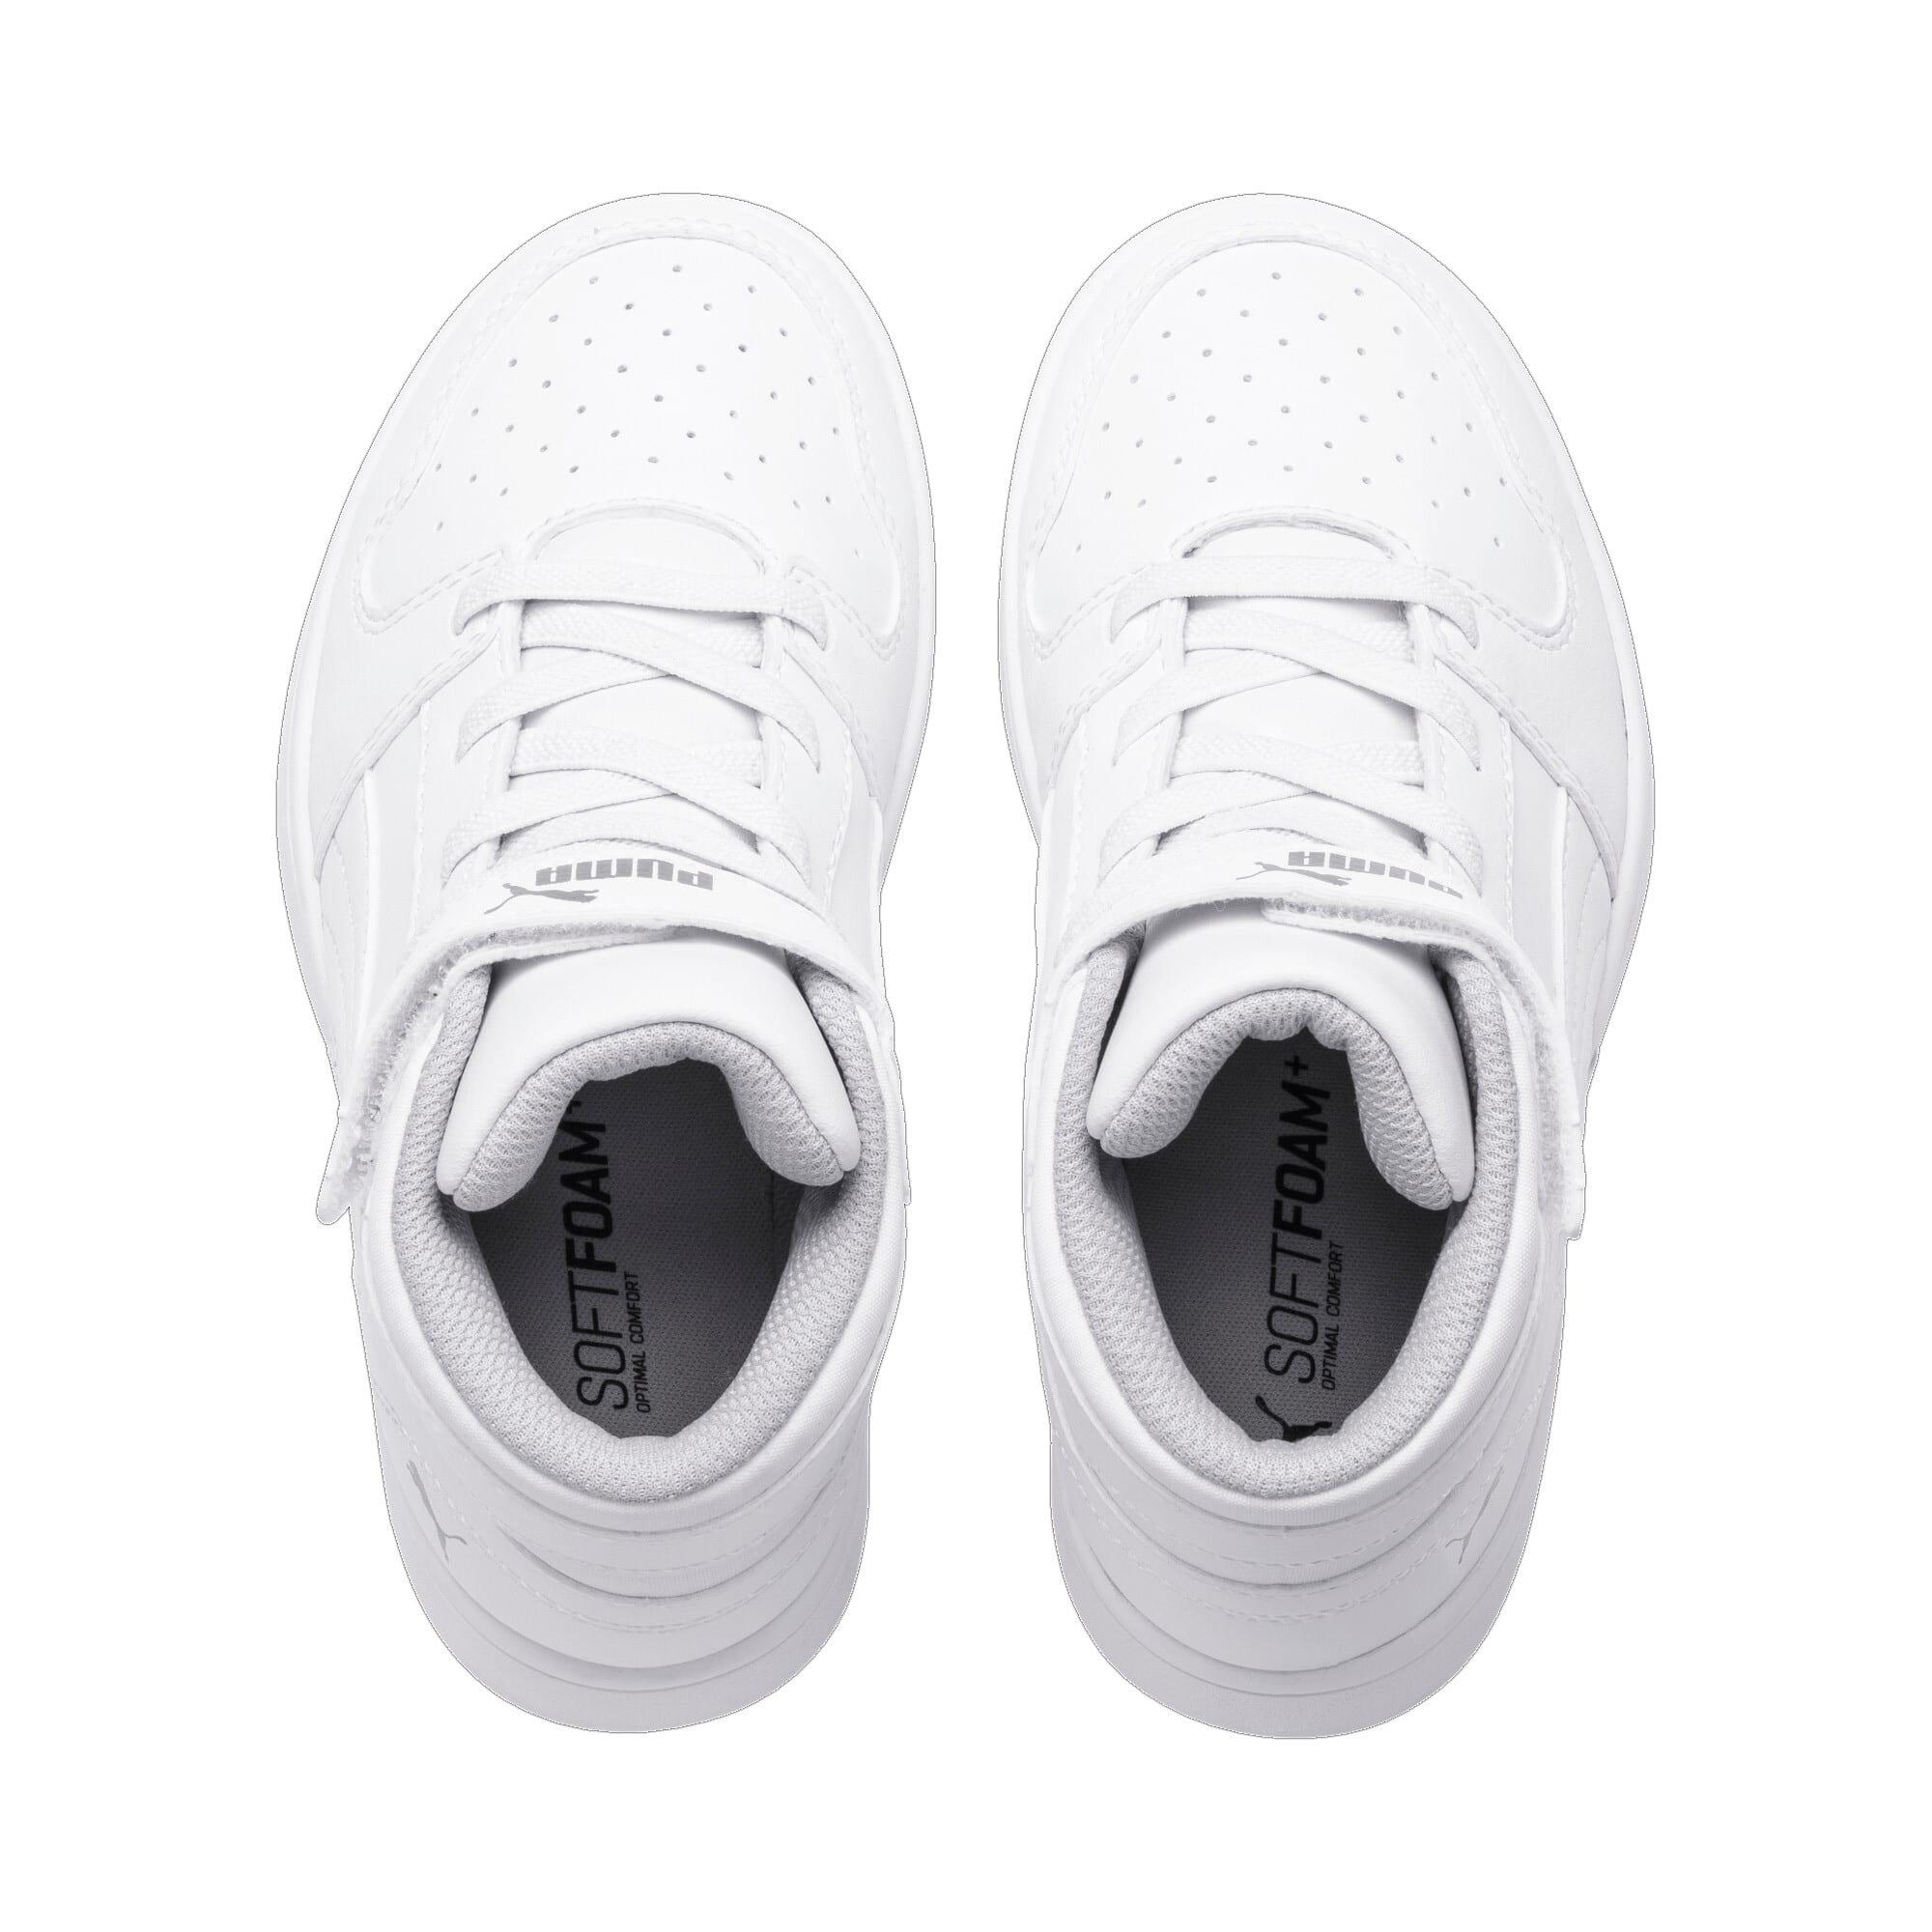 Thumbnail 6 of Rebound Lay-Up SL V Kids Sneaker, Puma White-Gray Violet, medium